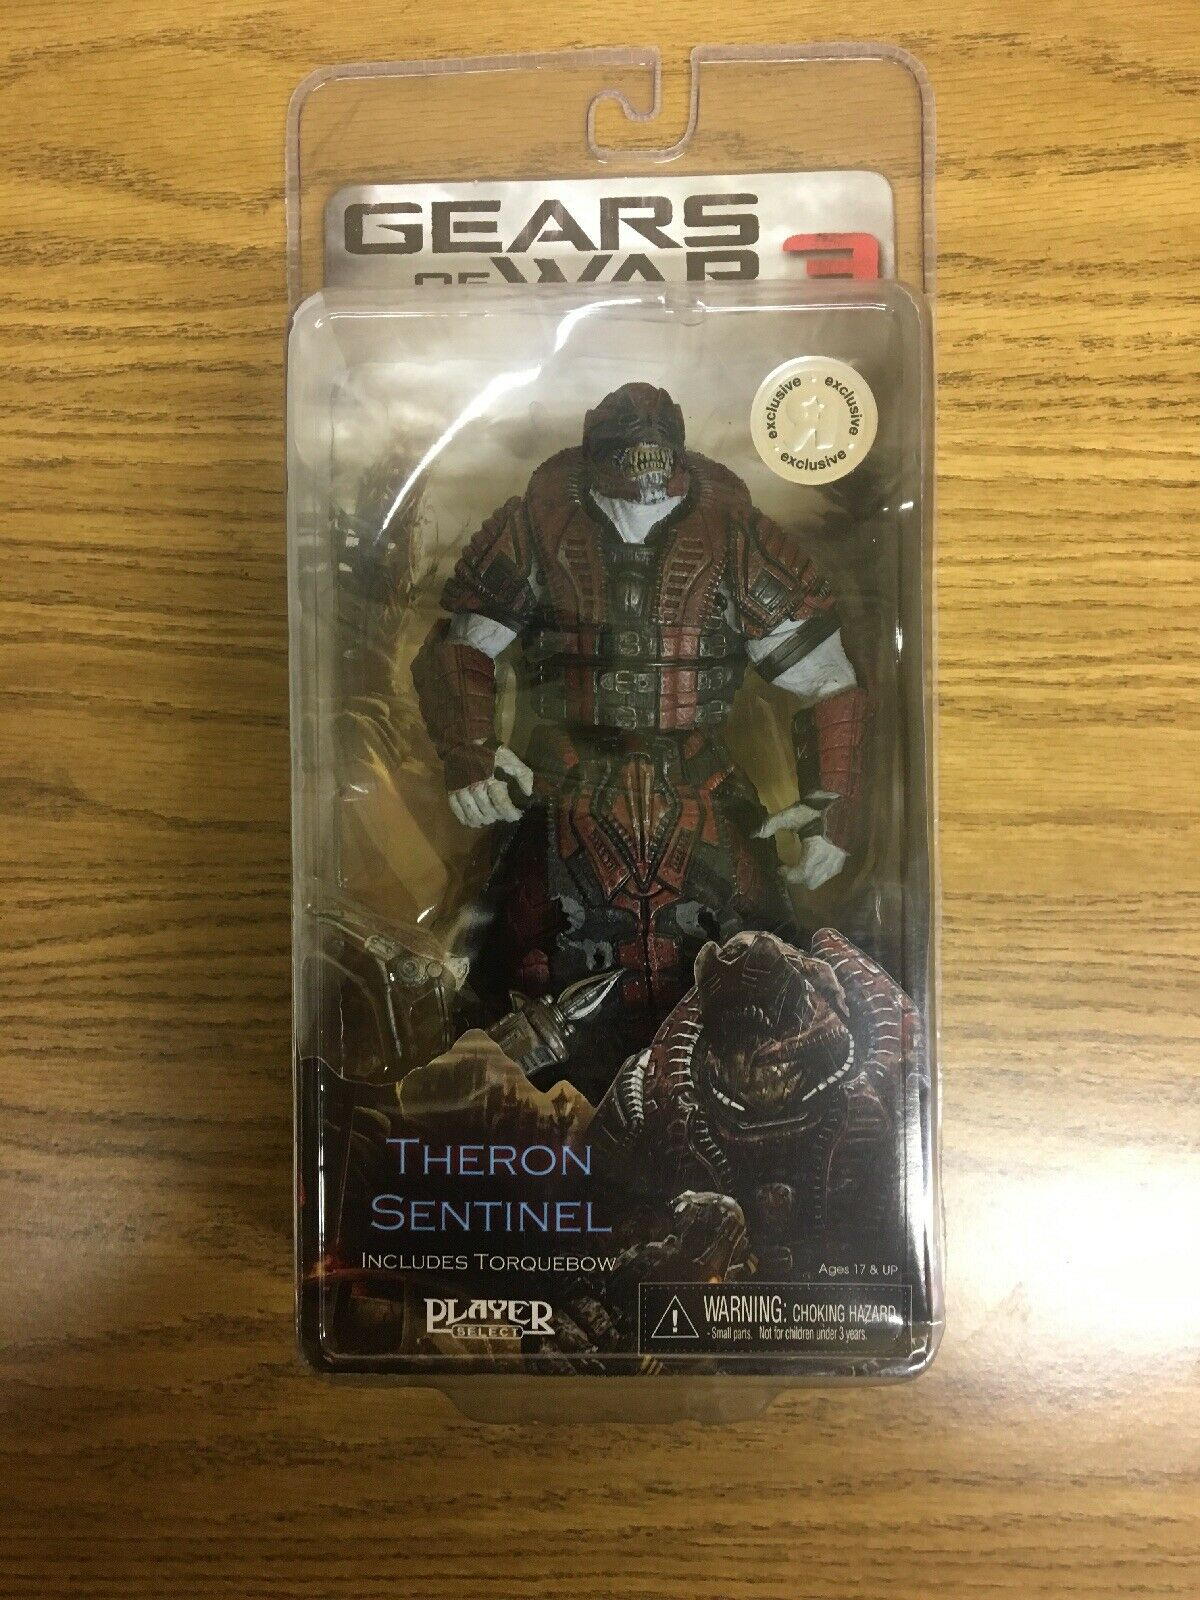 NECA Gears of War 3 sillones, sillones, sillones, la másCochea negra Jugueteota exclusiva. baf